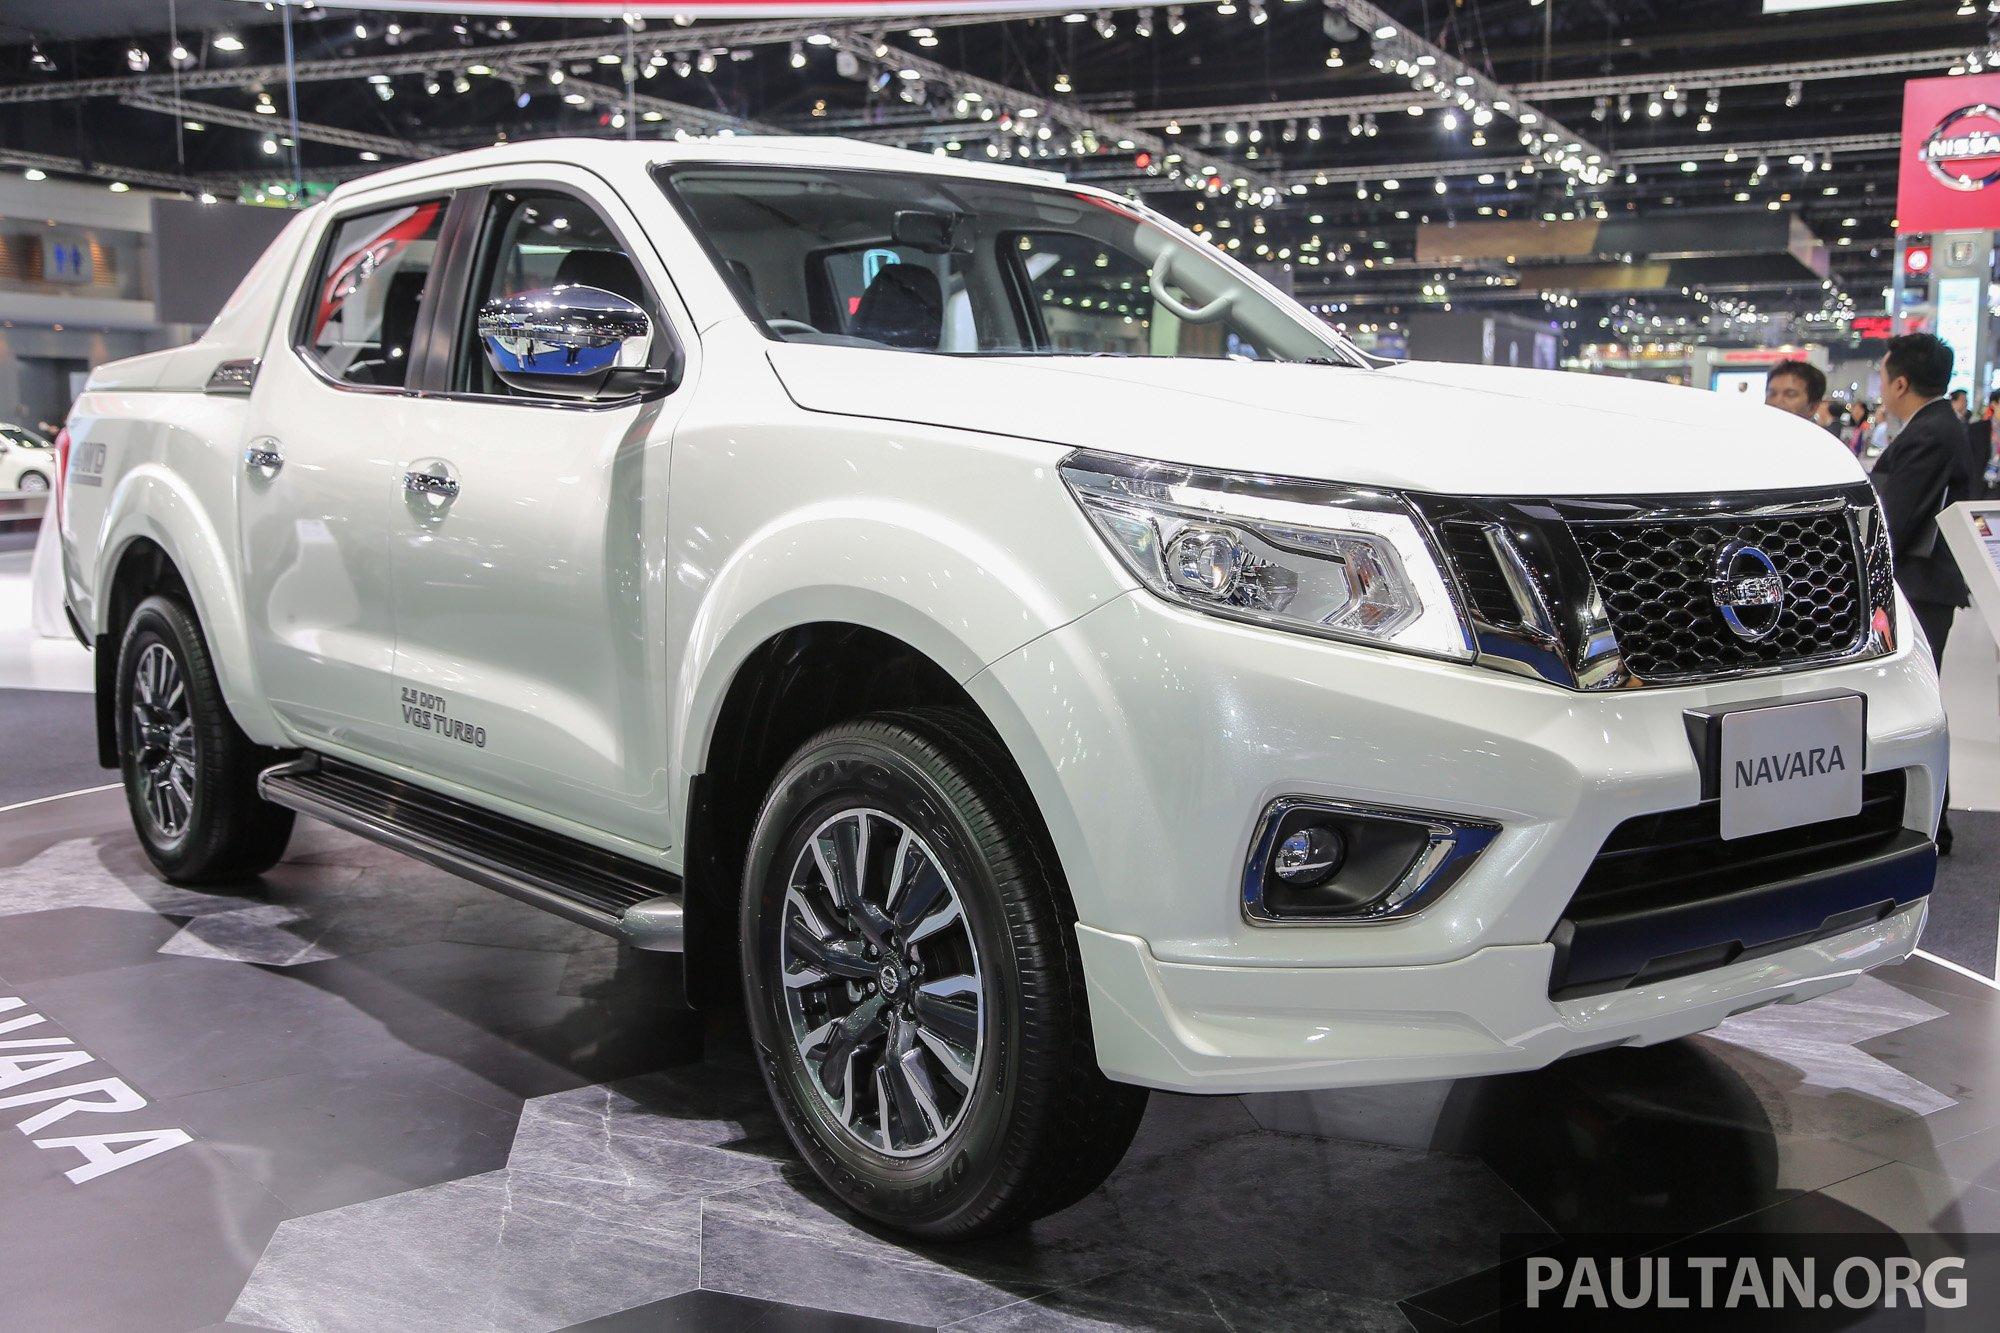 GALLERY: Nissan NP300 Navara Sportech in Bangkok